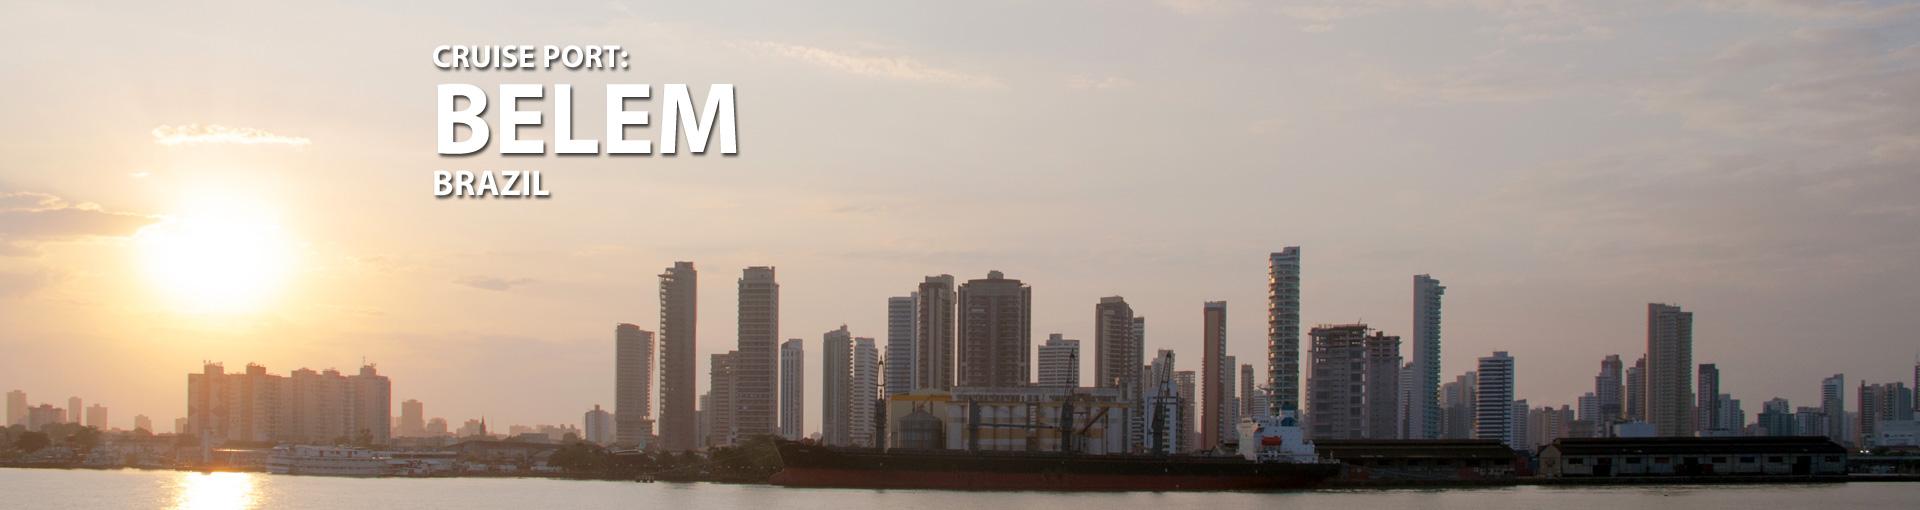 Cruises to Belem, Brazil